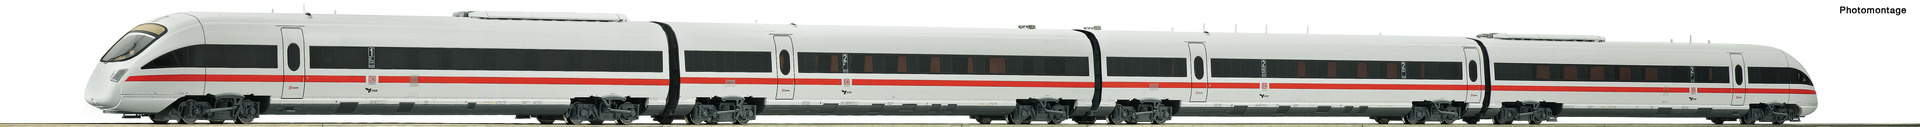 72106 Dieseltriebzug BR 605 DSB Snd.-1